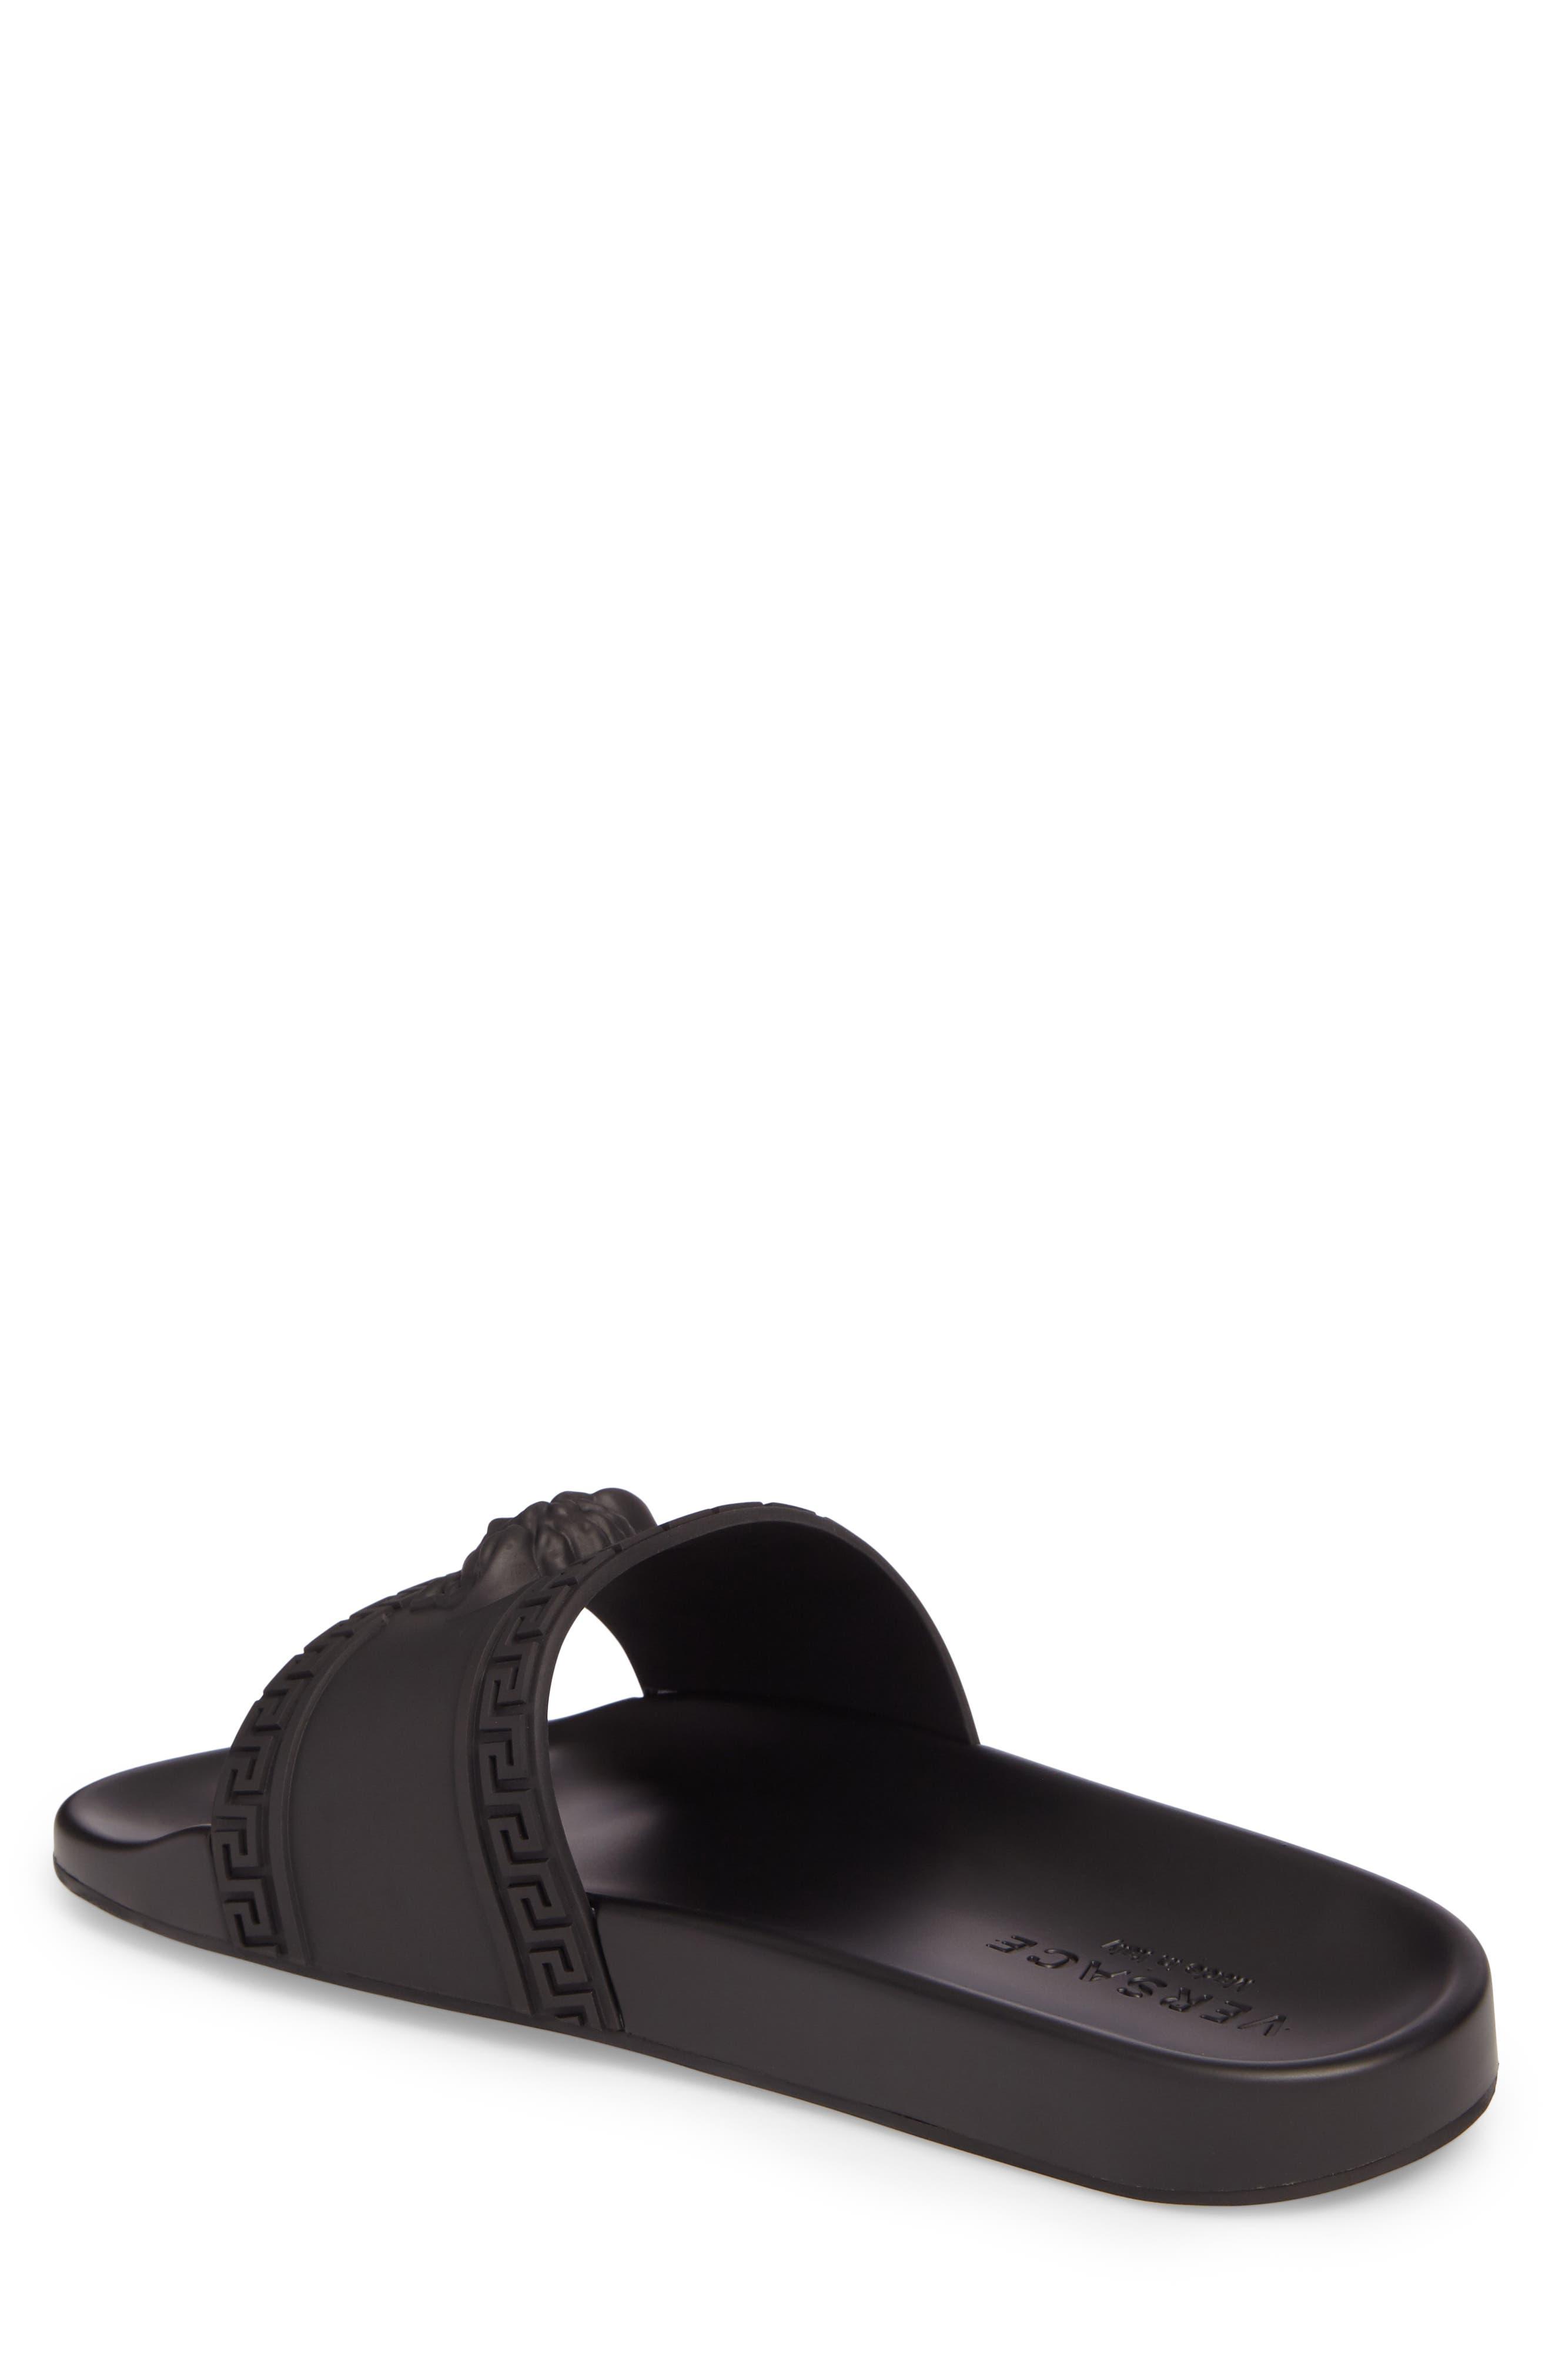 Men's Versace Sandals, Slides & Flip-Flops | Nordstrom